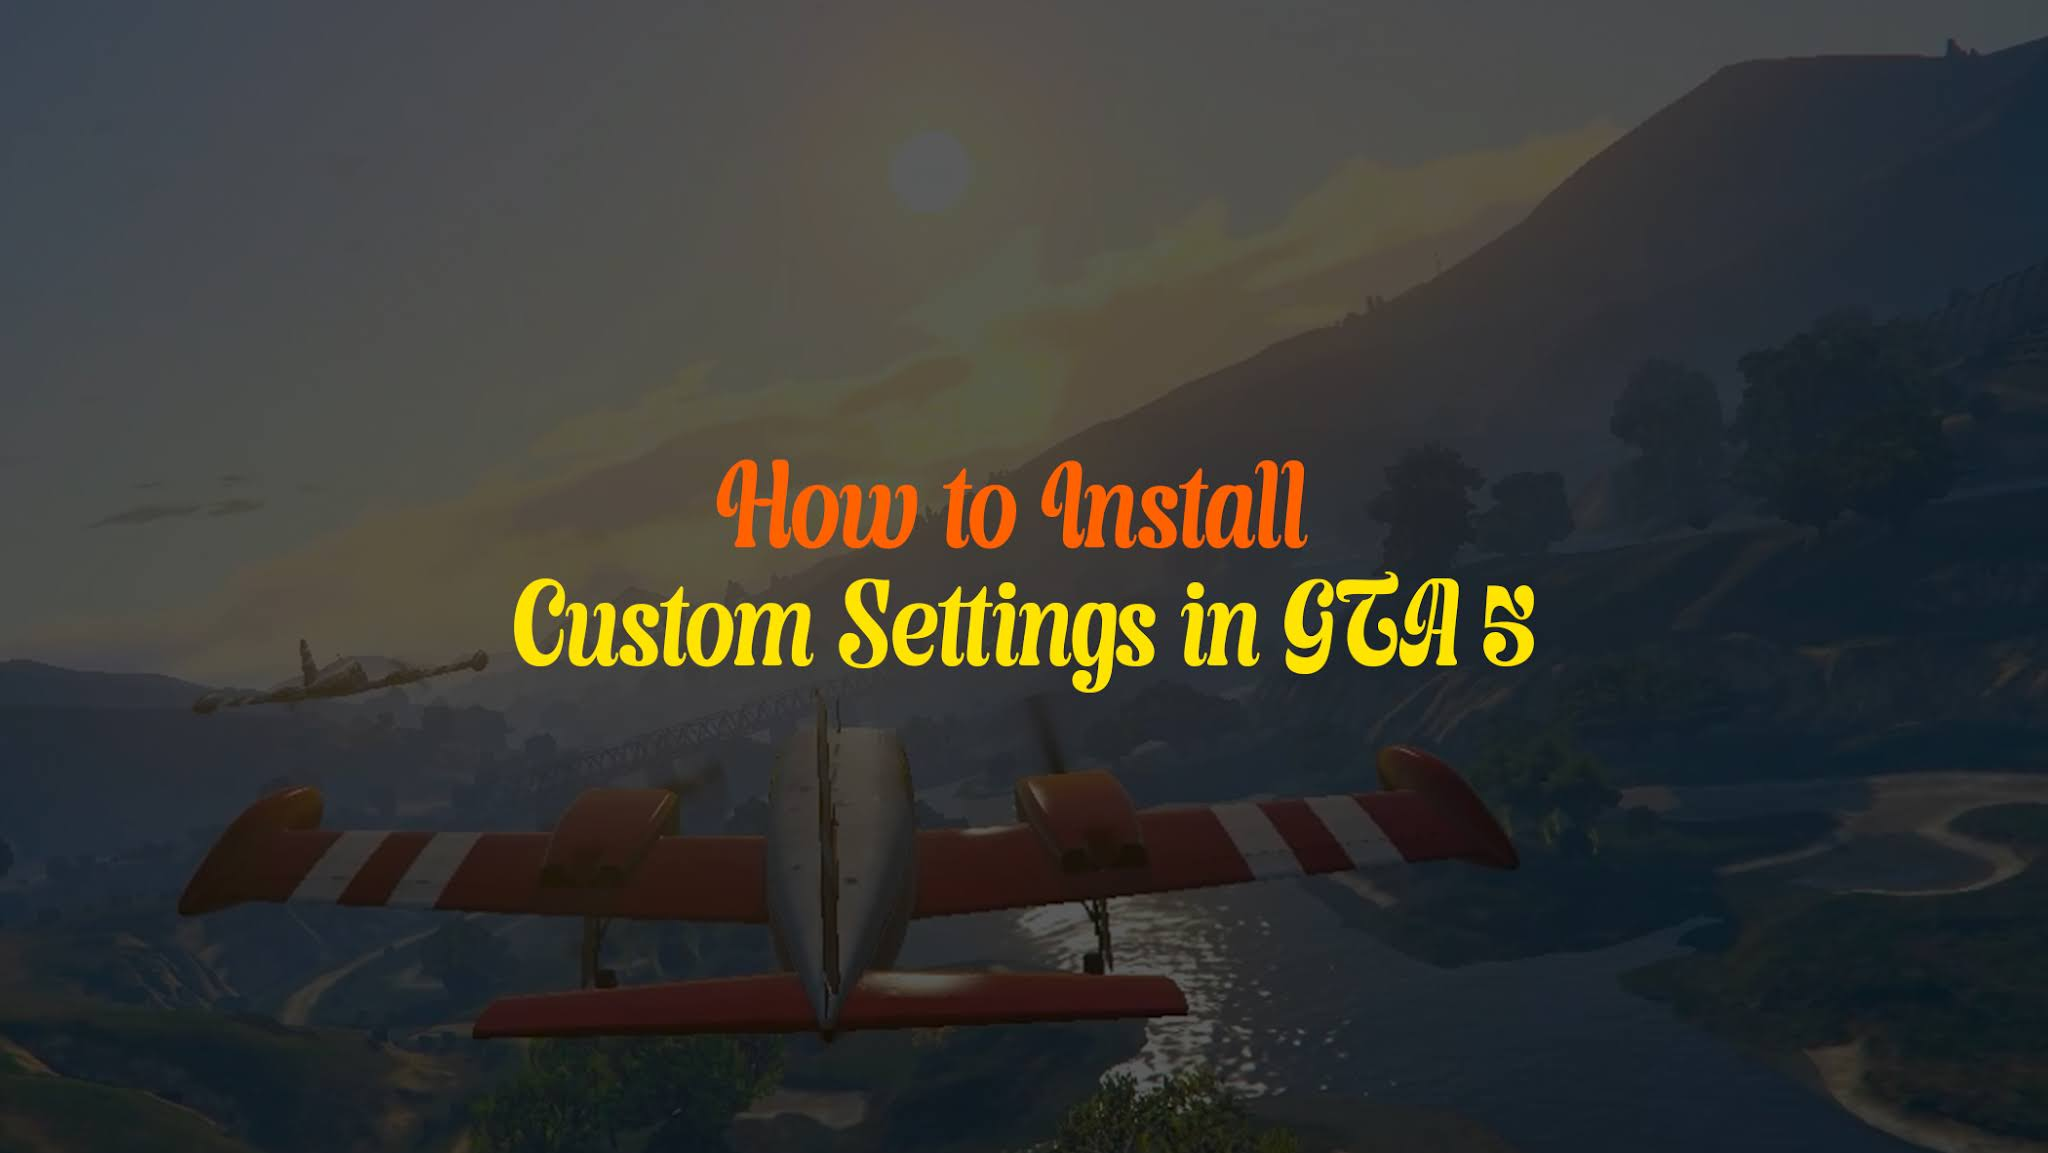 how to install custom settings in GTA 5 - AdeelDrew How to Install Custom Settings in GTA 5 Video result for How to Install Custom Settings in GTA 5 Easy way to install mods on GTA 5 - setting up & getting How to Install Custom Settings in GTA 5 How to install CUSTOM MAPS!!! (Mod Tutorial) Gta5 PC How to Install Custom Settings in GTA 5 GTA 5 2021 Best ReShade Custom Settings How to Install GameConfig for GTA 5 (GTA Gamer) How do you get to settings on GTA 5? How do you install custom maps on GTA 5? How do I install mods on GTA 5? How do I install GTA 5 mod menu? Very Low PC settings How to install Grand Theft Auto V mods on PC The Ultimate GTA V Performance Guide Secret Tips to Boost How To Install GTA 5 Mods Grand Theft Auto V PC Graphics & Performance Guide Nvidia settings for gta v gta v settings.xml download gta 5 mods gta 5 low graphics settings gta 5 settings.xml tweaks how to install gta 5 mods 2020 how to install gta 5 mods ps4 gta v settings.xml high